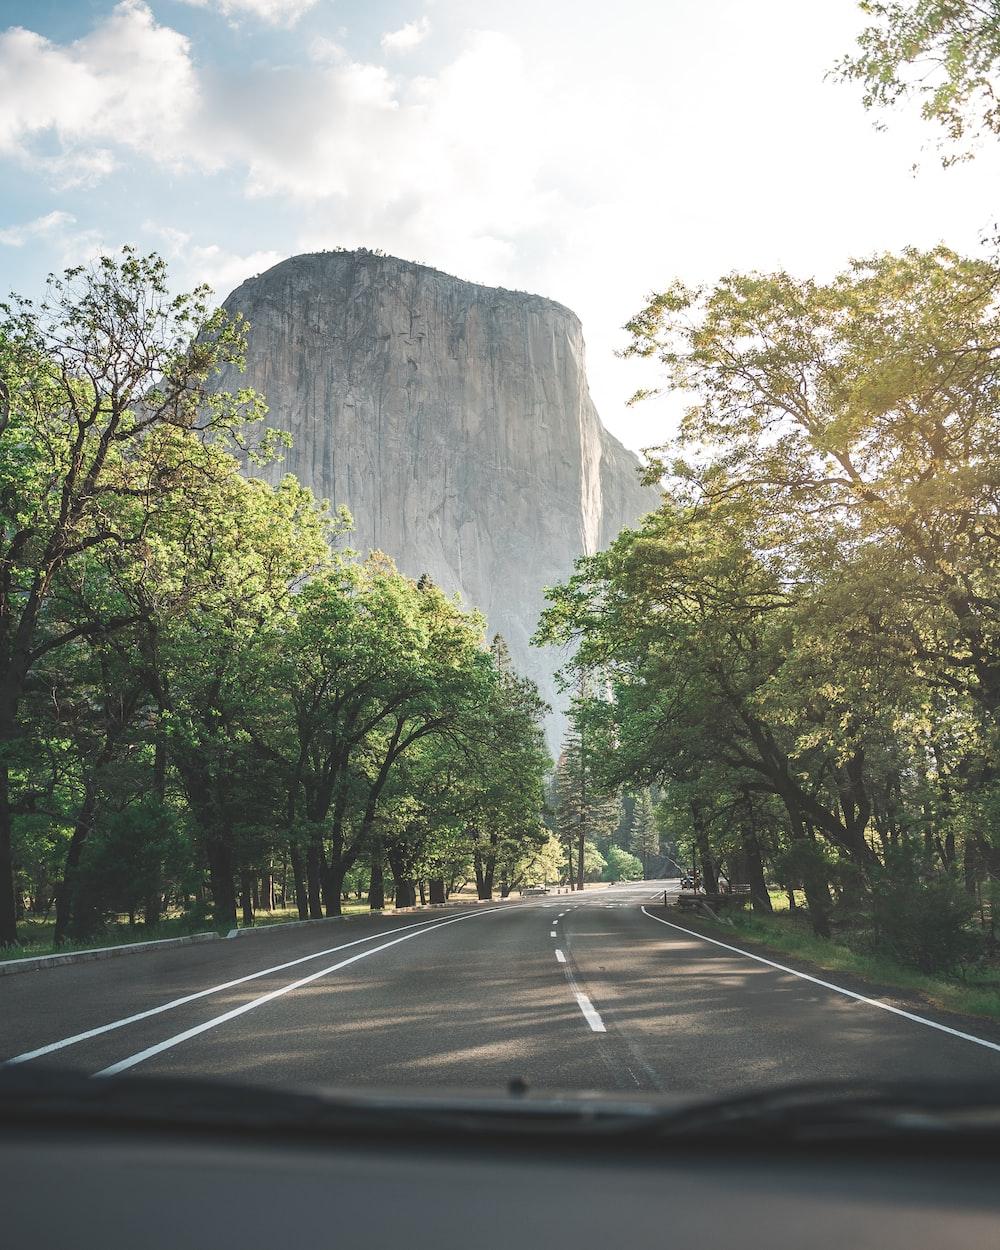 landscape photography of Devil's Tower